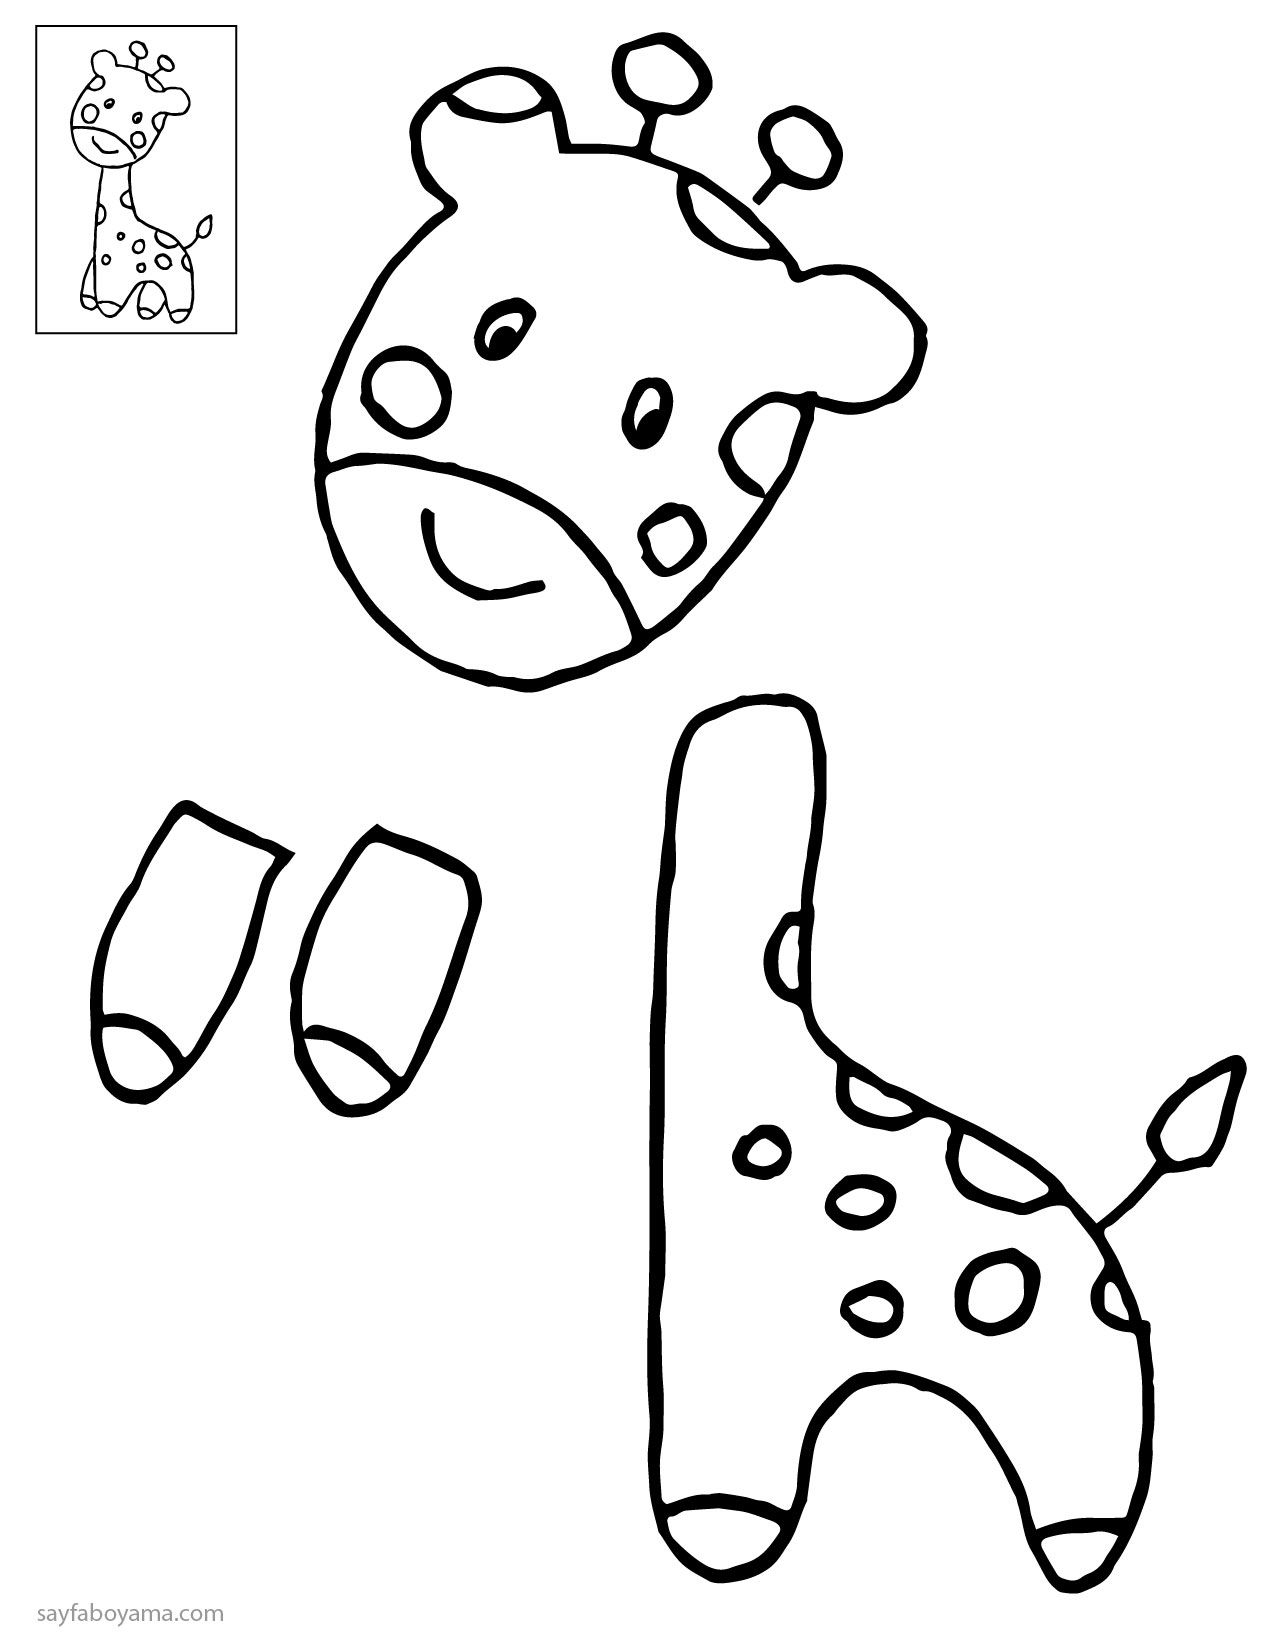 Krokotak Cow In Black And White Zvierata T